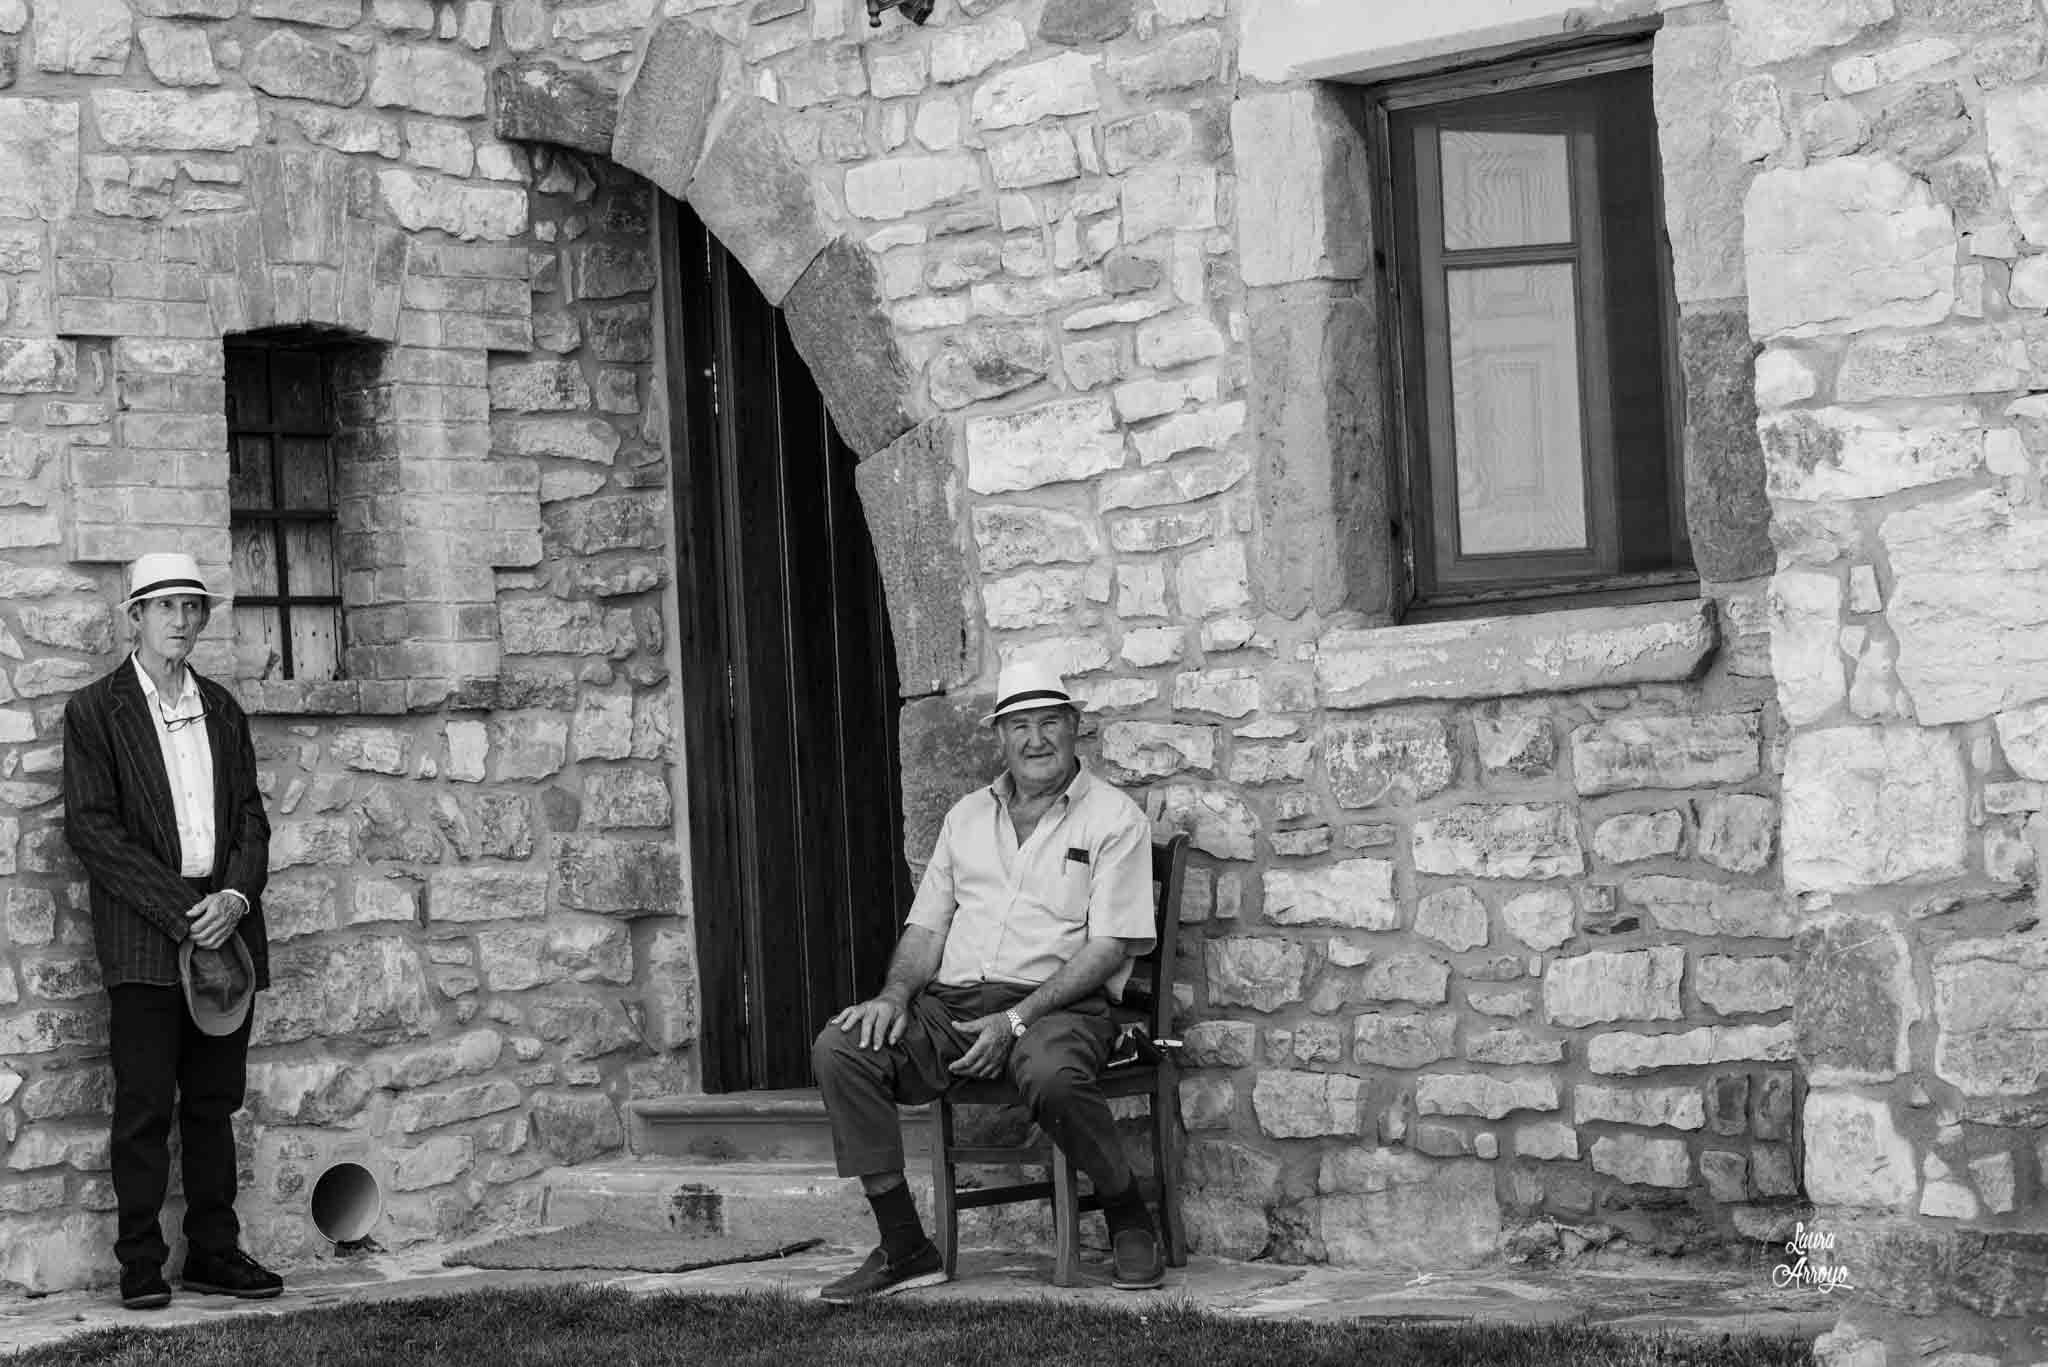 reportaje-Boda-rustica-caldes-de-montbui-fotografa-laura-arroyo-vilanova-i-la-geltru-barcelona-31